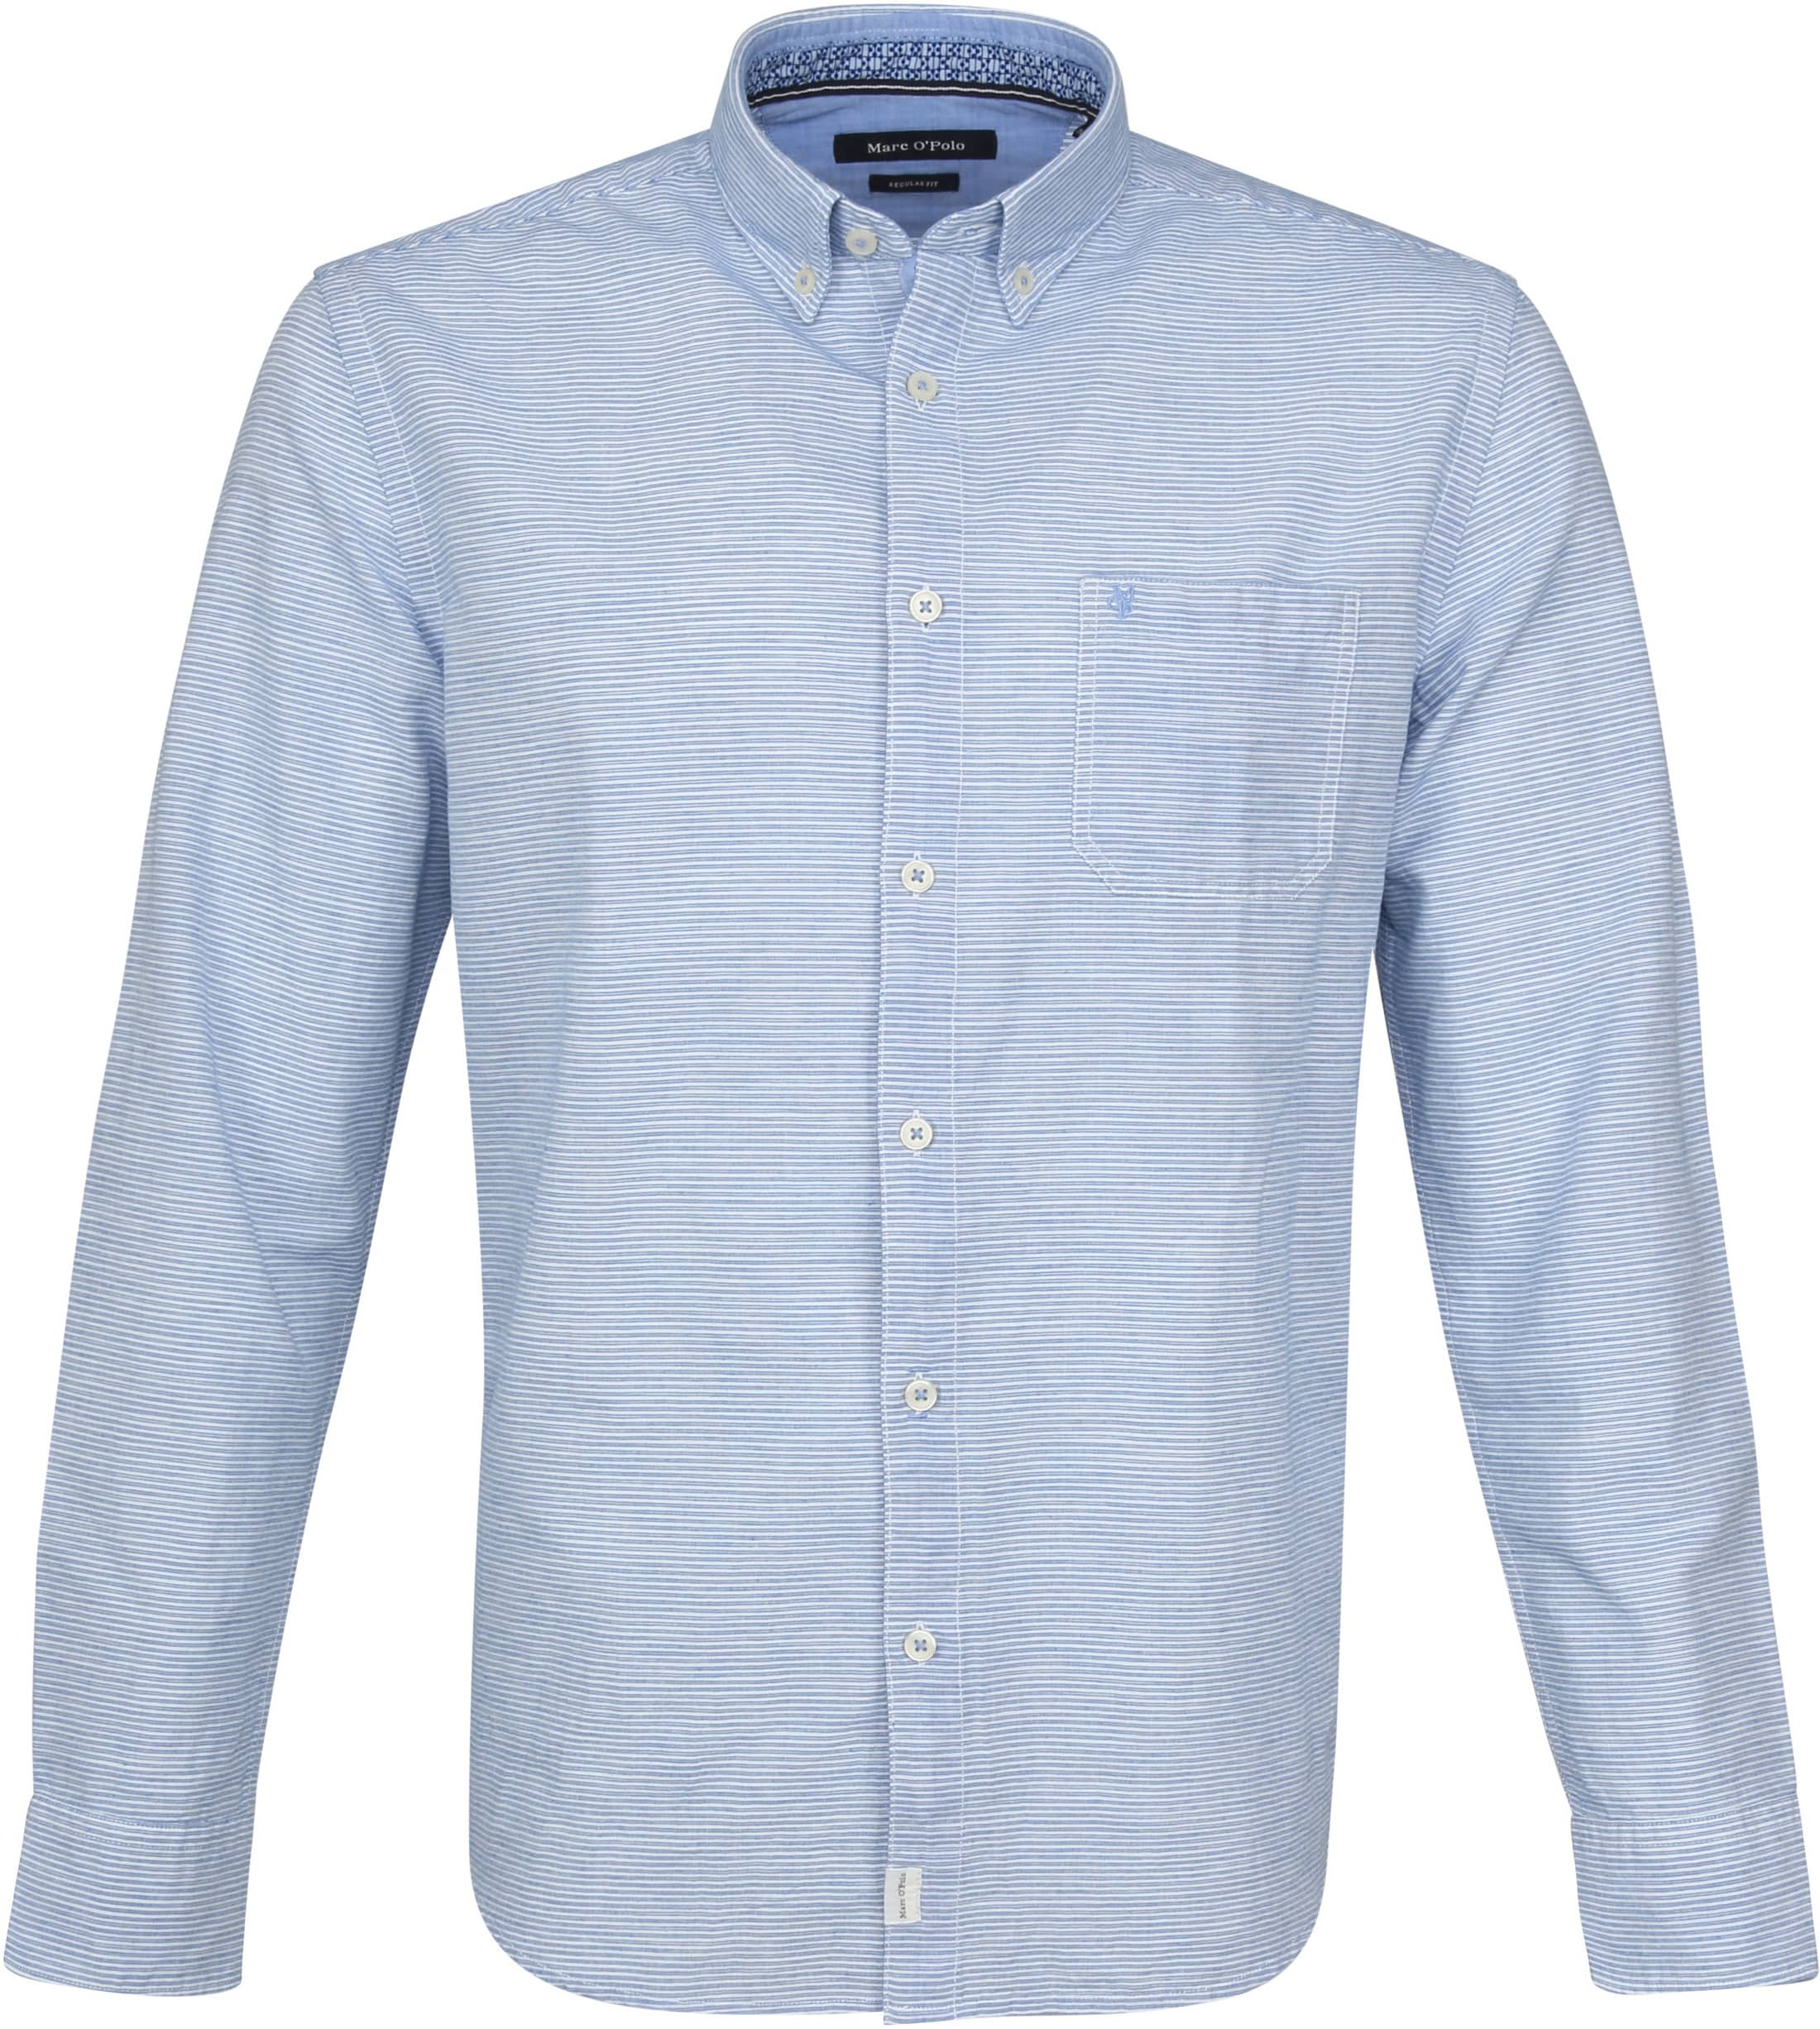 hot sale online 7b9fd c57b7 Marc O'Polo Overhemd Strepen Blauw 923733742338 online ...